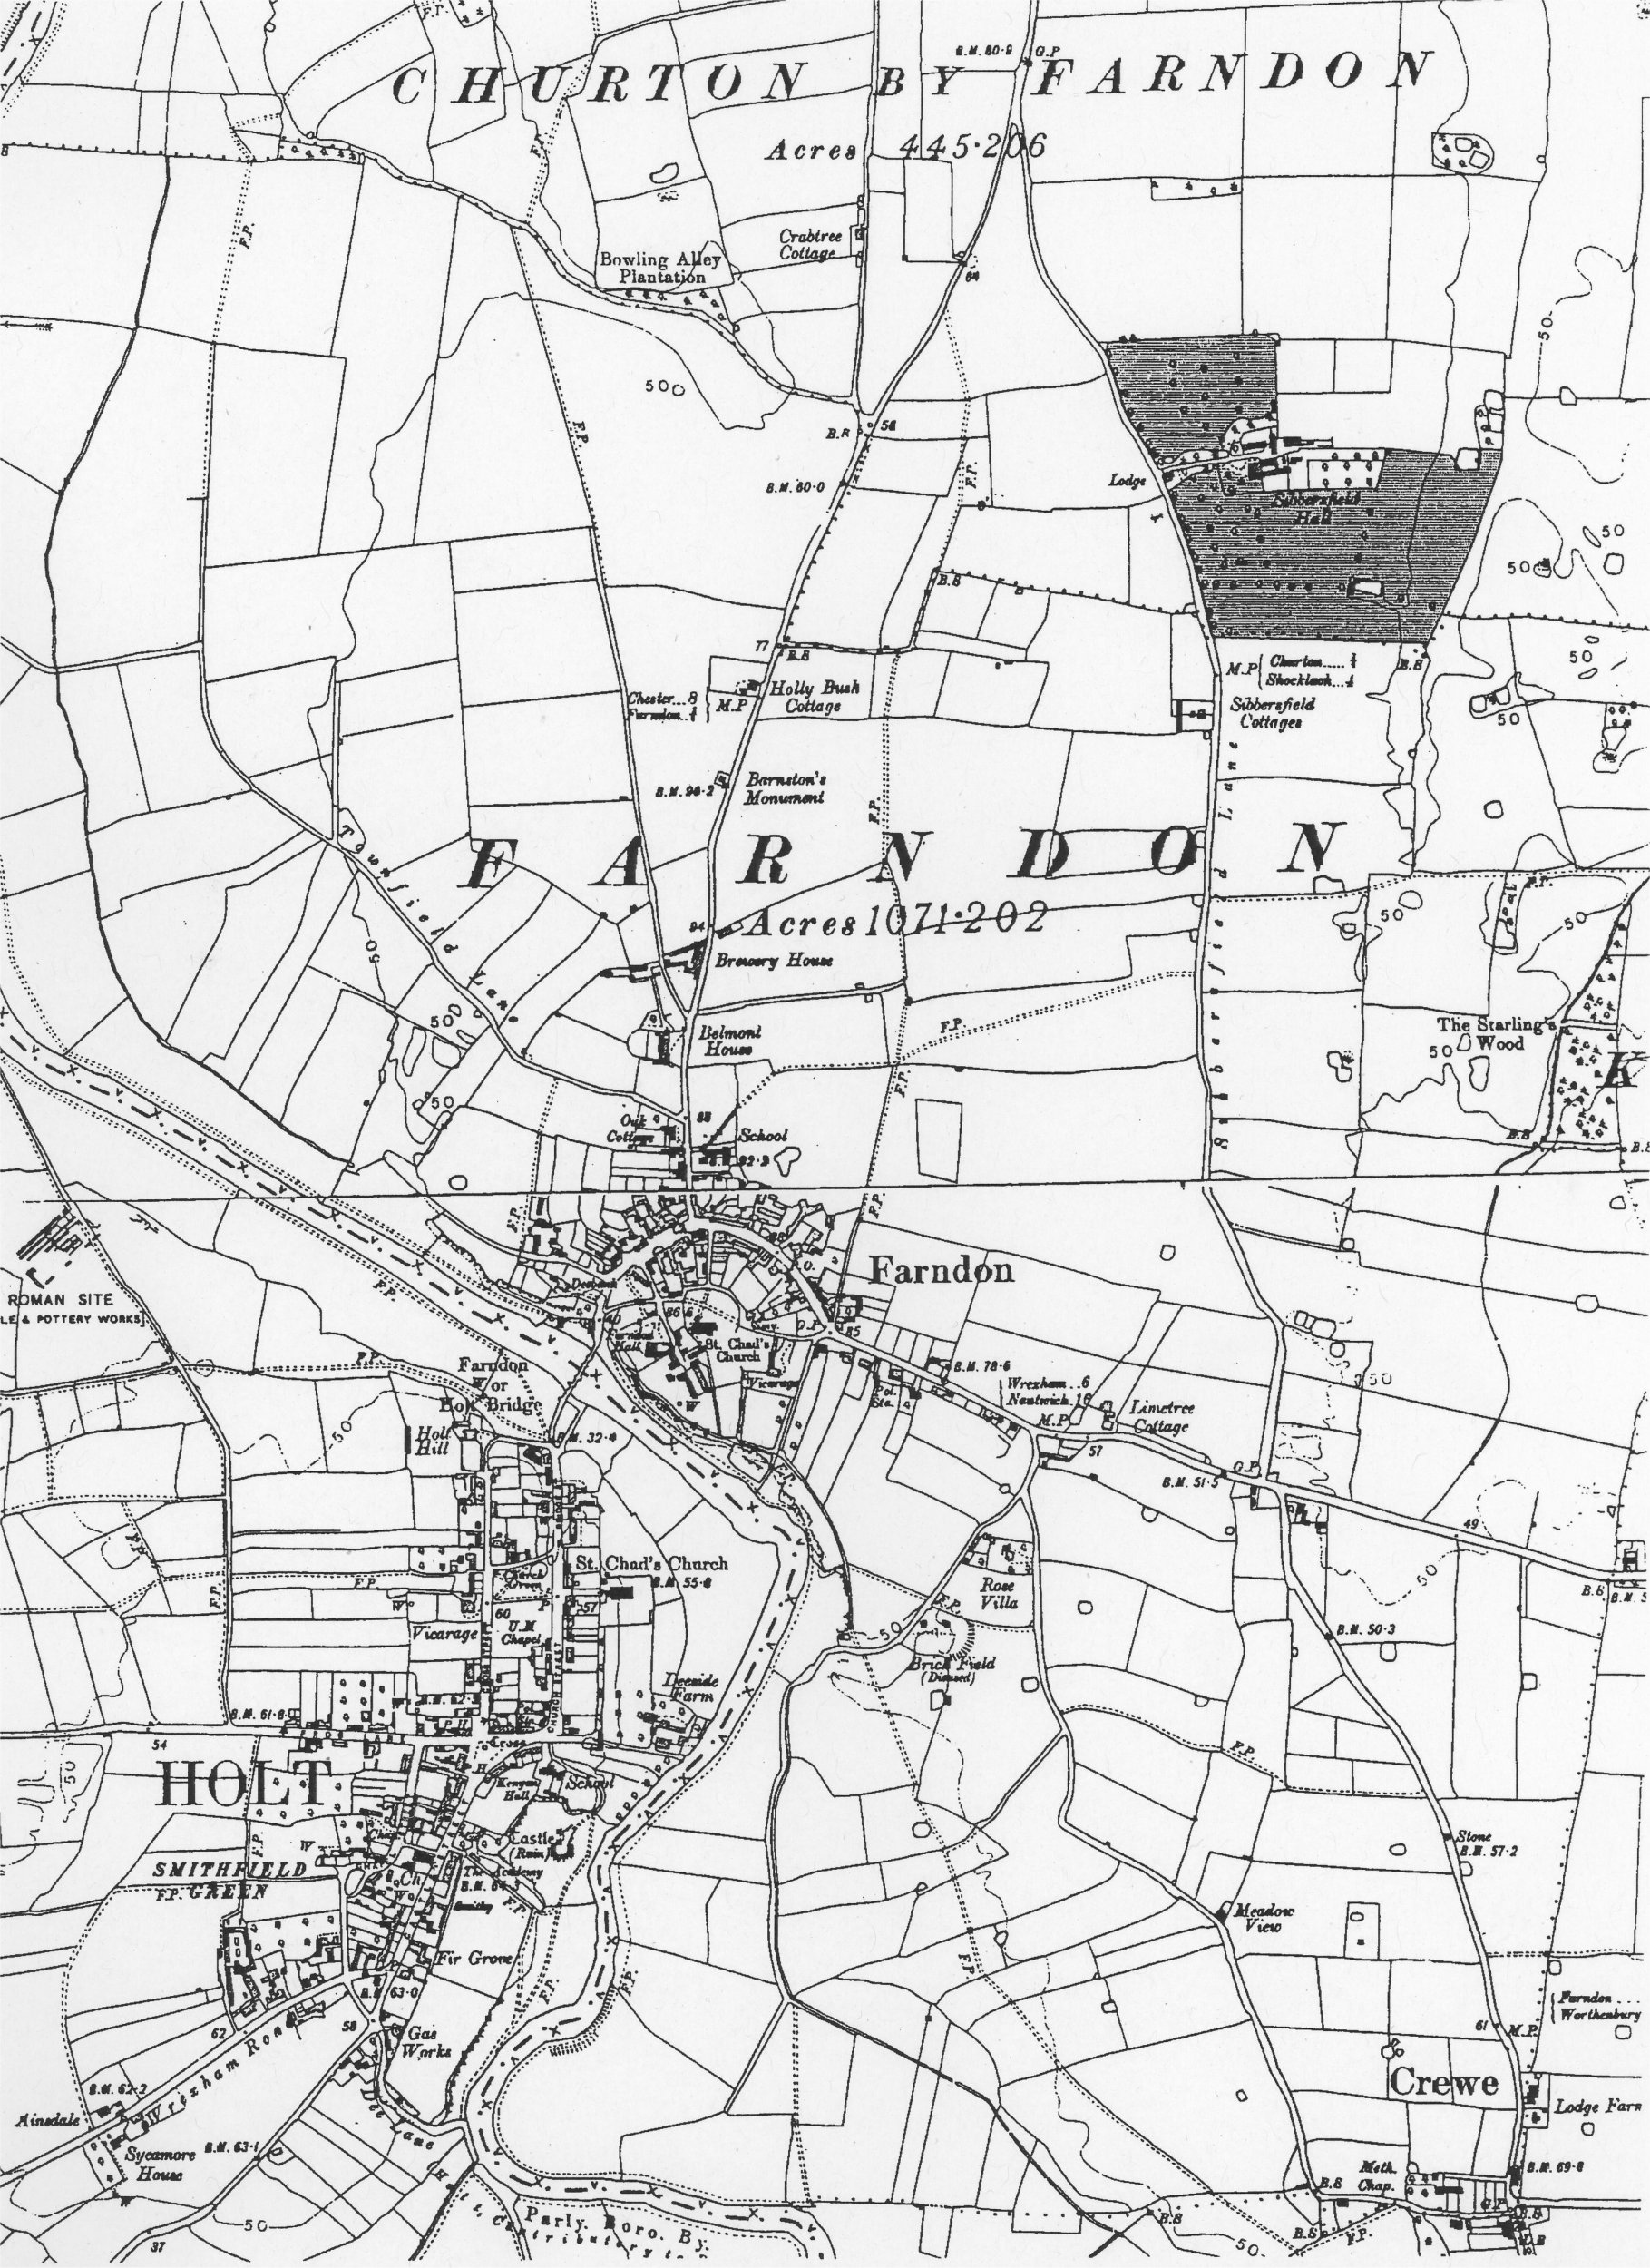 farndon parish history website